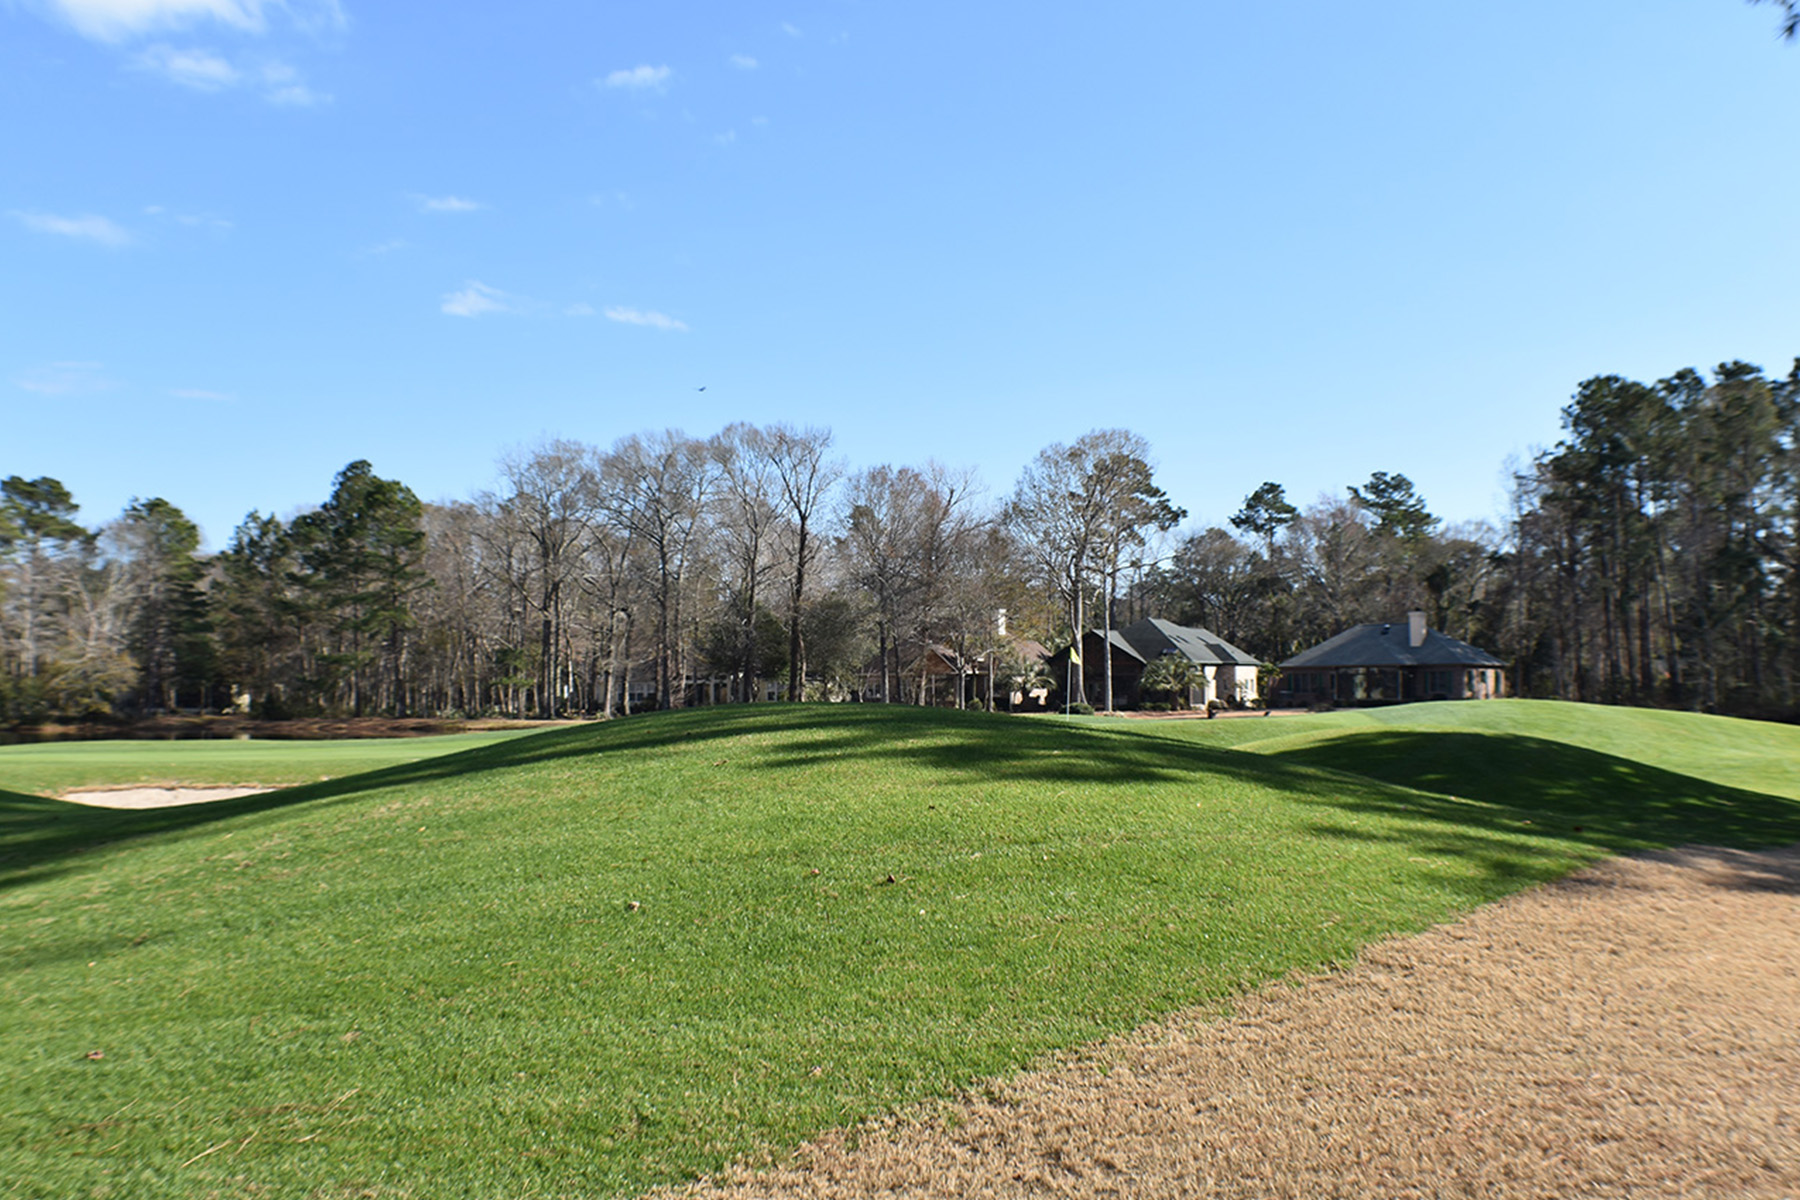 Additional photo for property listing at 104 Turtle Creek Drive, Pawleys Island, SC 29585 104  Turtle Creek Drive Pawleys Island, South Carolina 29585 United States